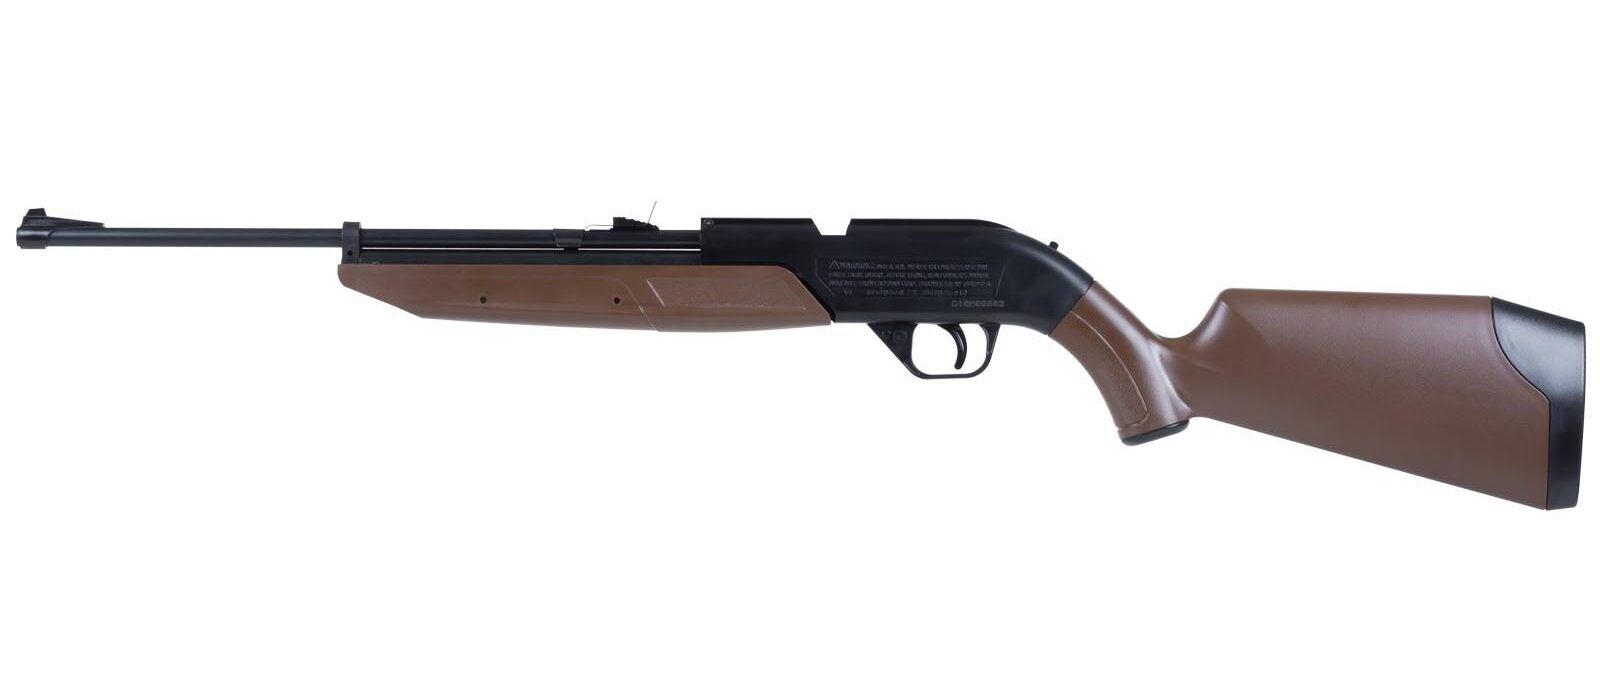 The Crosman 760B Pumpmaster is a best bb gun for pump models